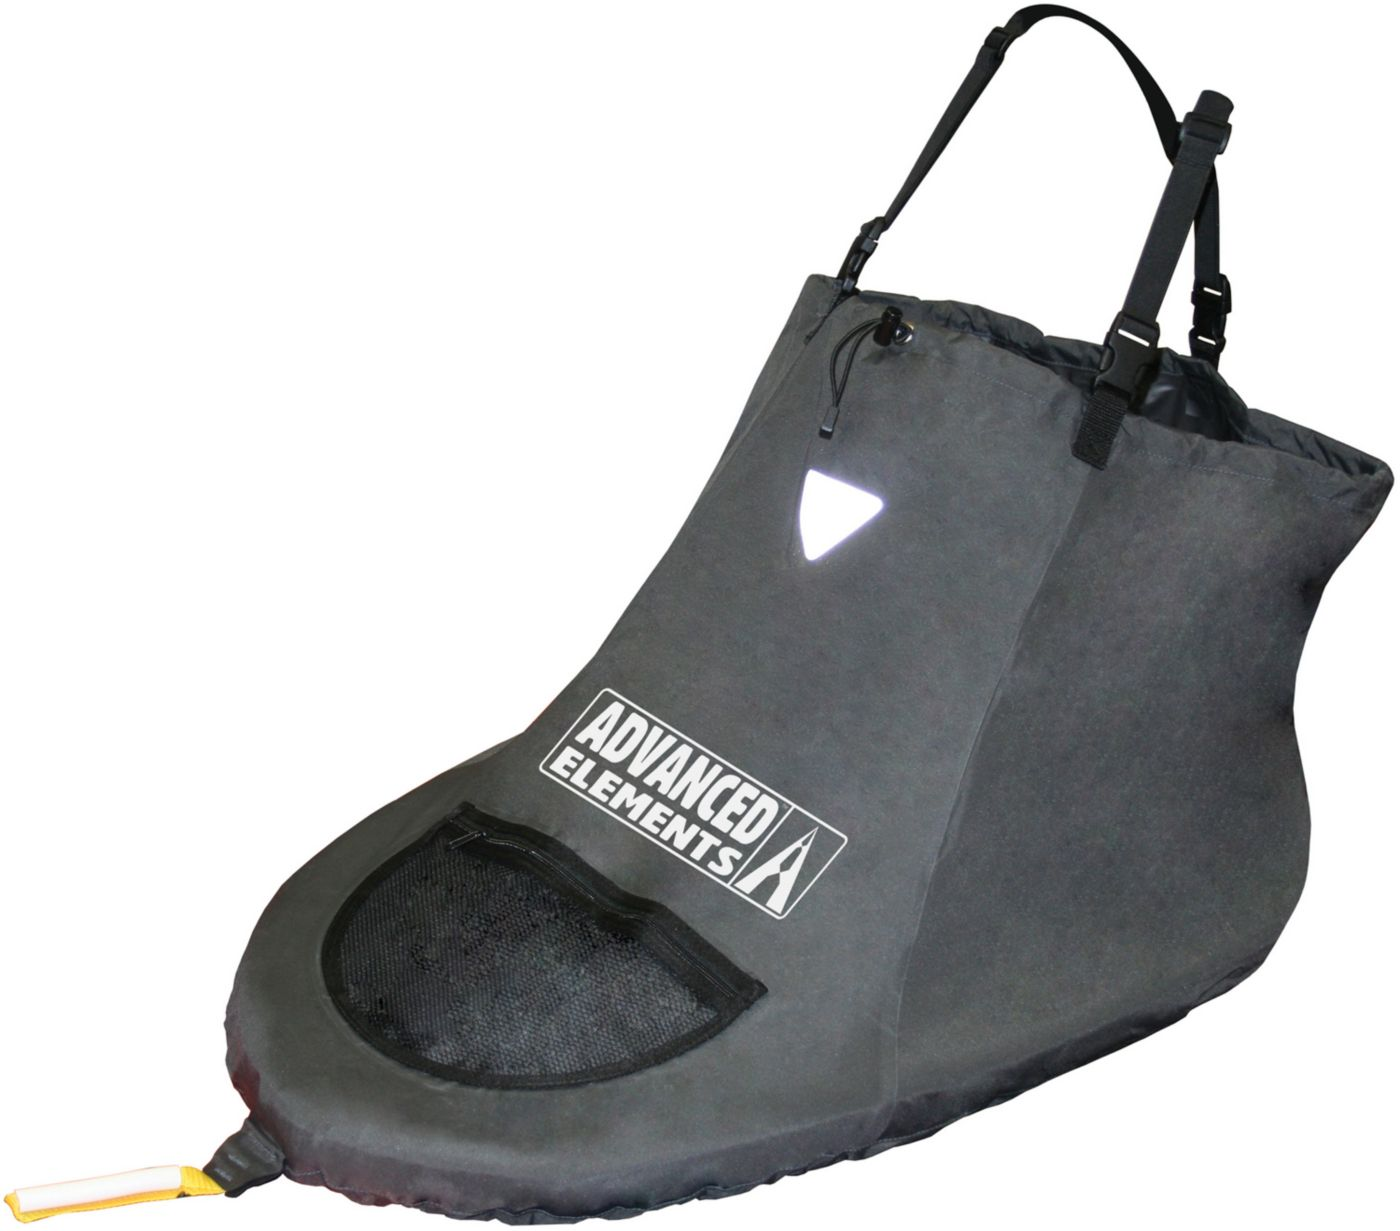 Advanced Elements Touring Inflatable Kayak Spray Skirt